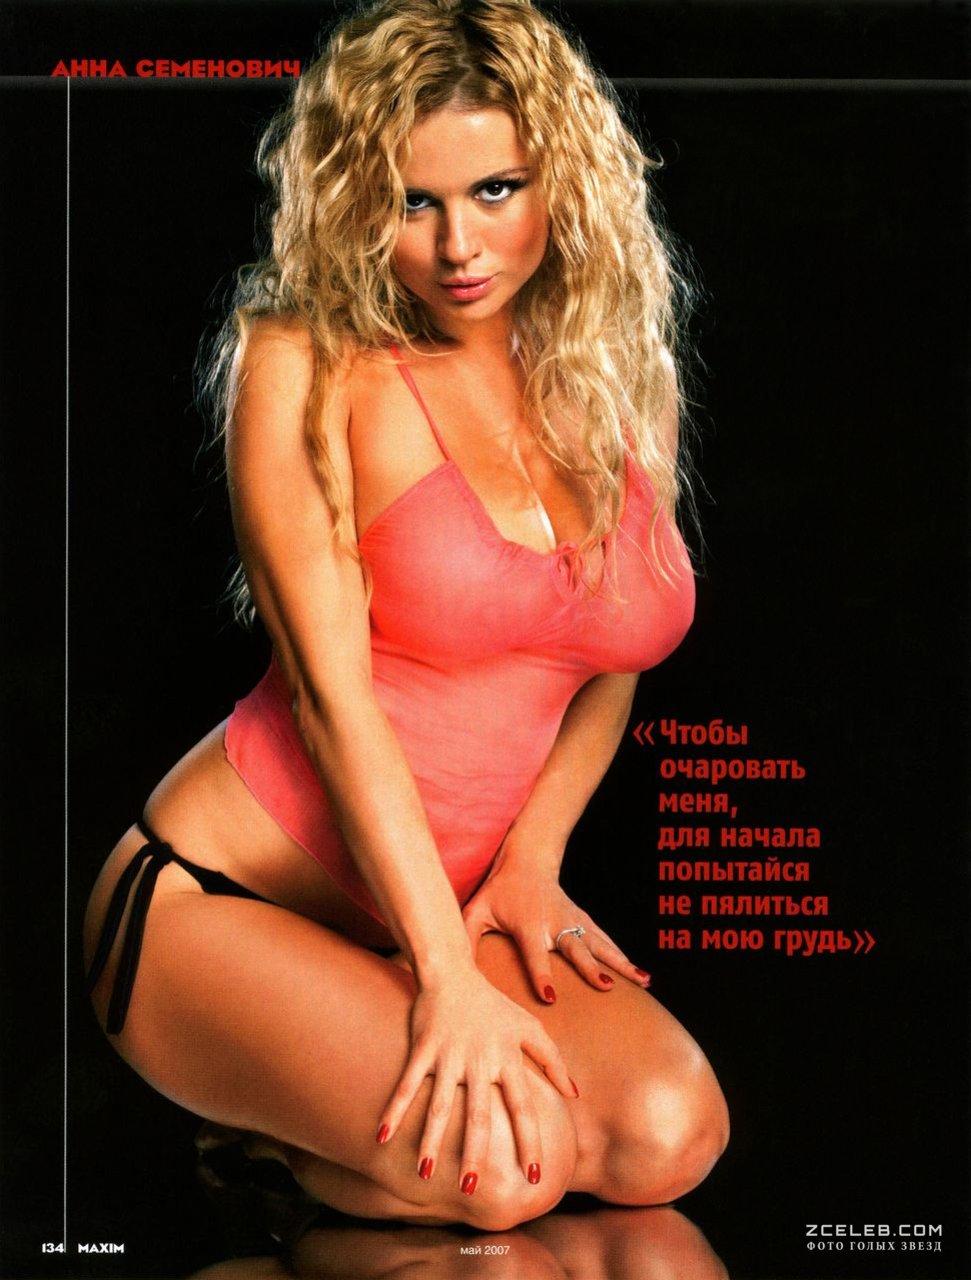 dnya-foto-porno-video-anni-semenovich-smotret-vse